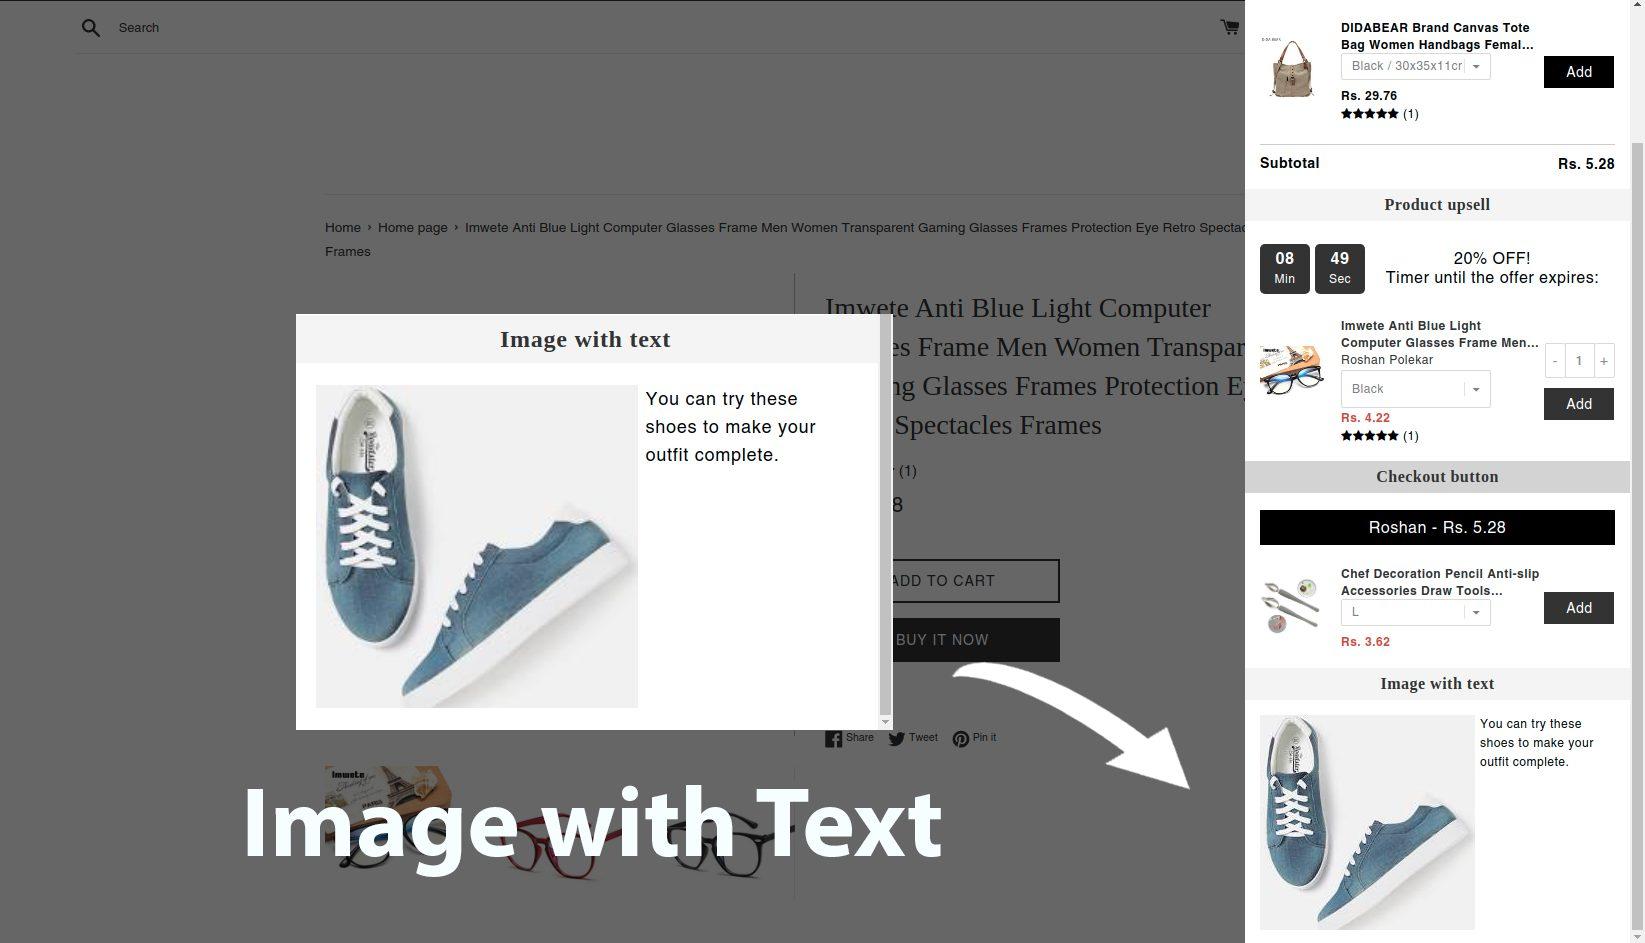 image-with-text-widget